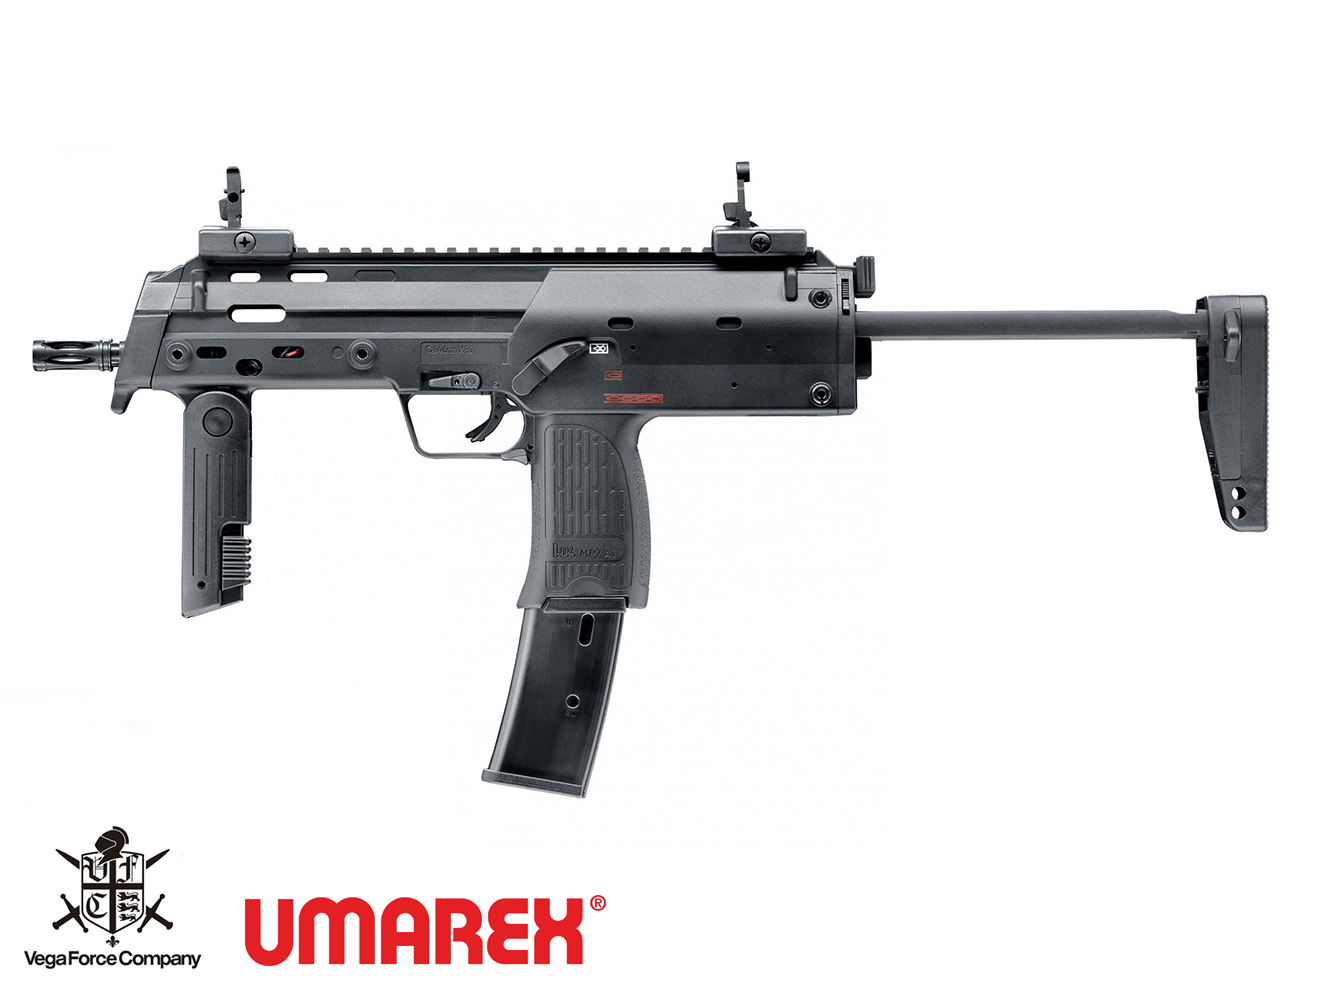 VFC/Umarex 電動サブマシンガン MP7A1 NewGeneration◆電動ガン/SMG/新型/電子トリガー/FET/正式ライセンス/JPVer/フルサイズ